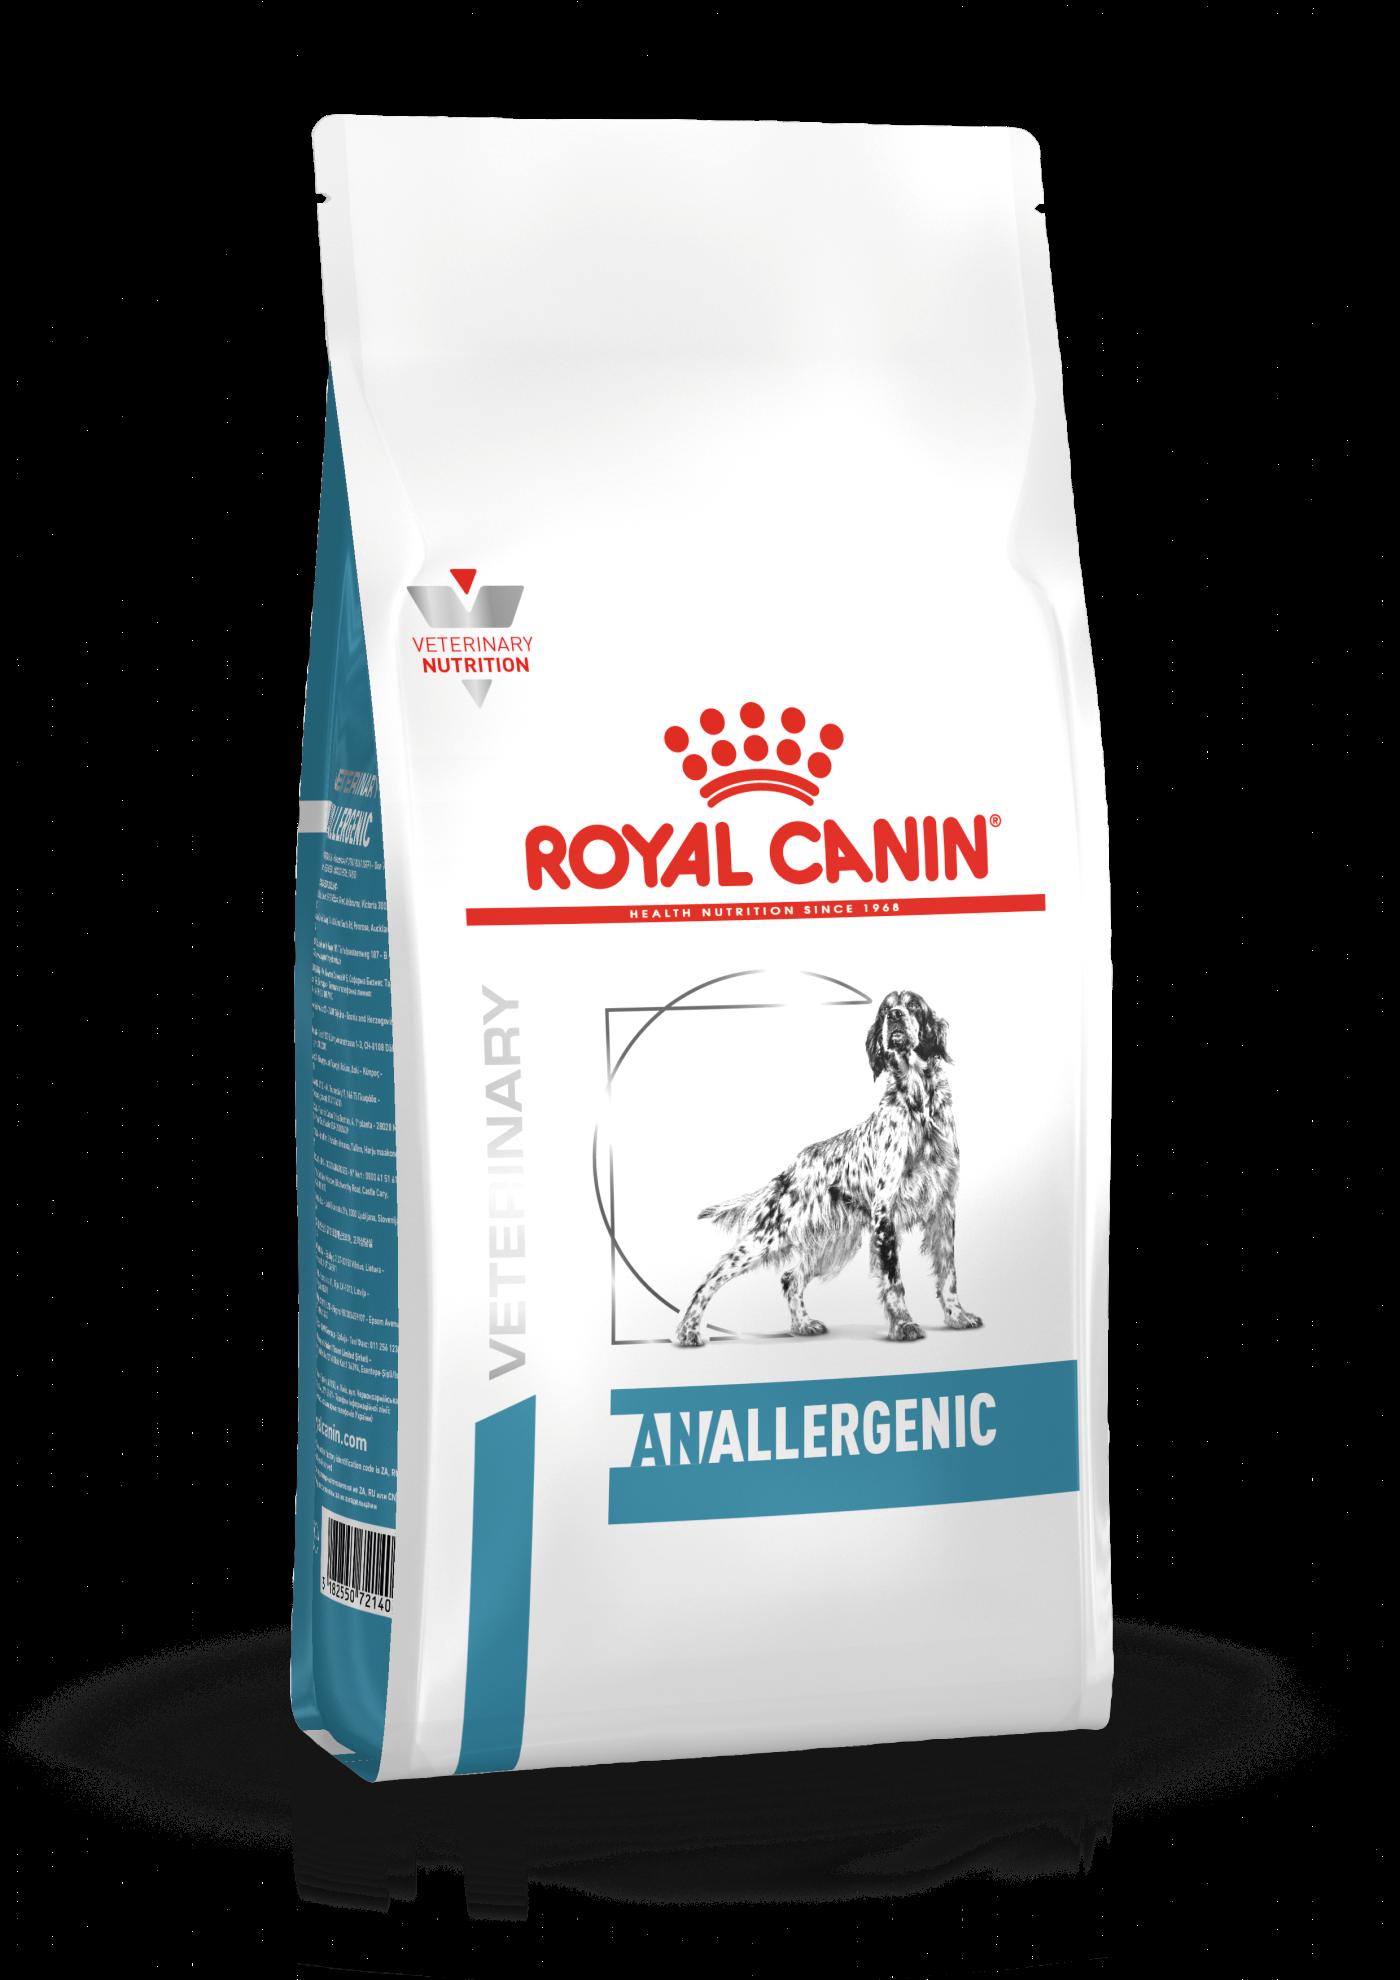 www.royalcanin.com